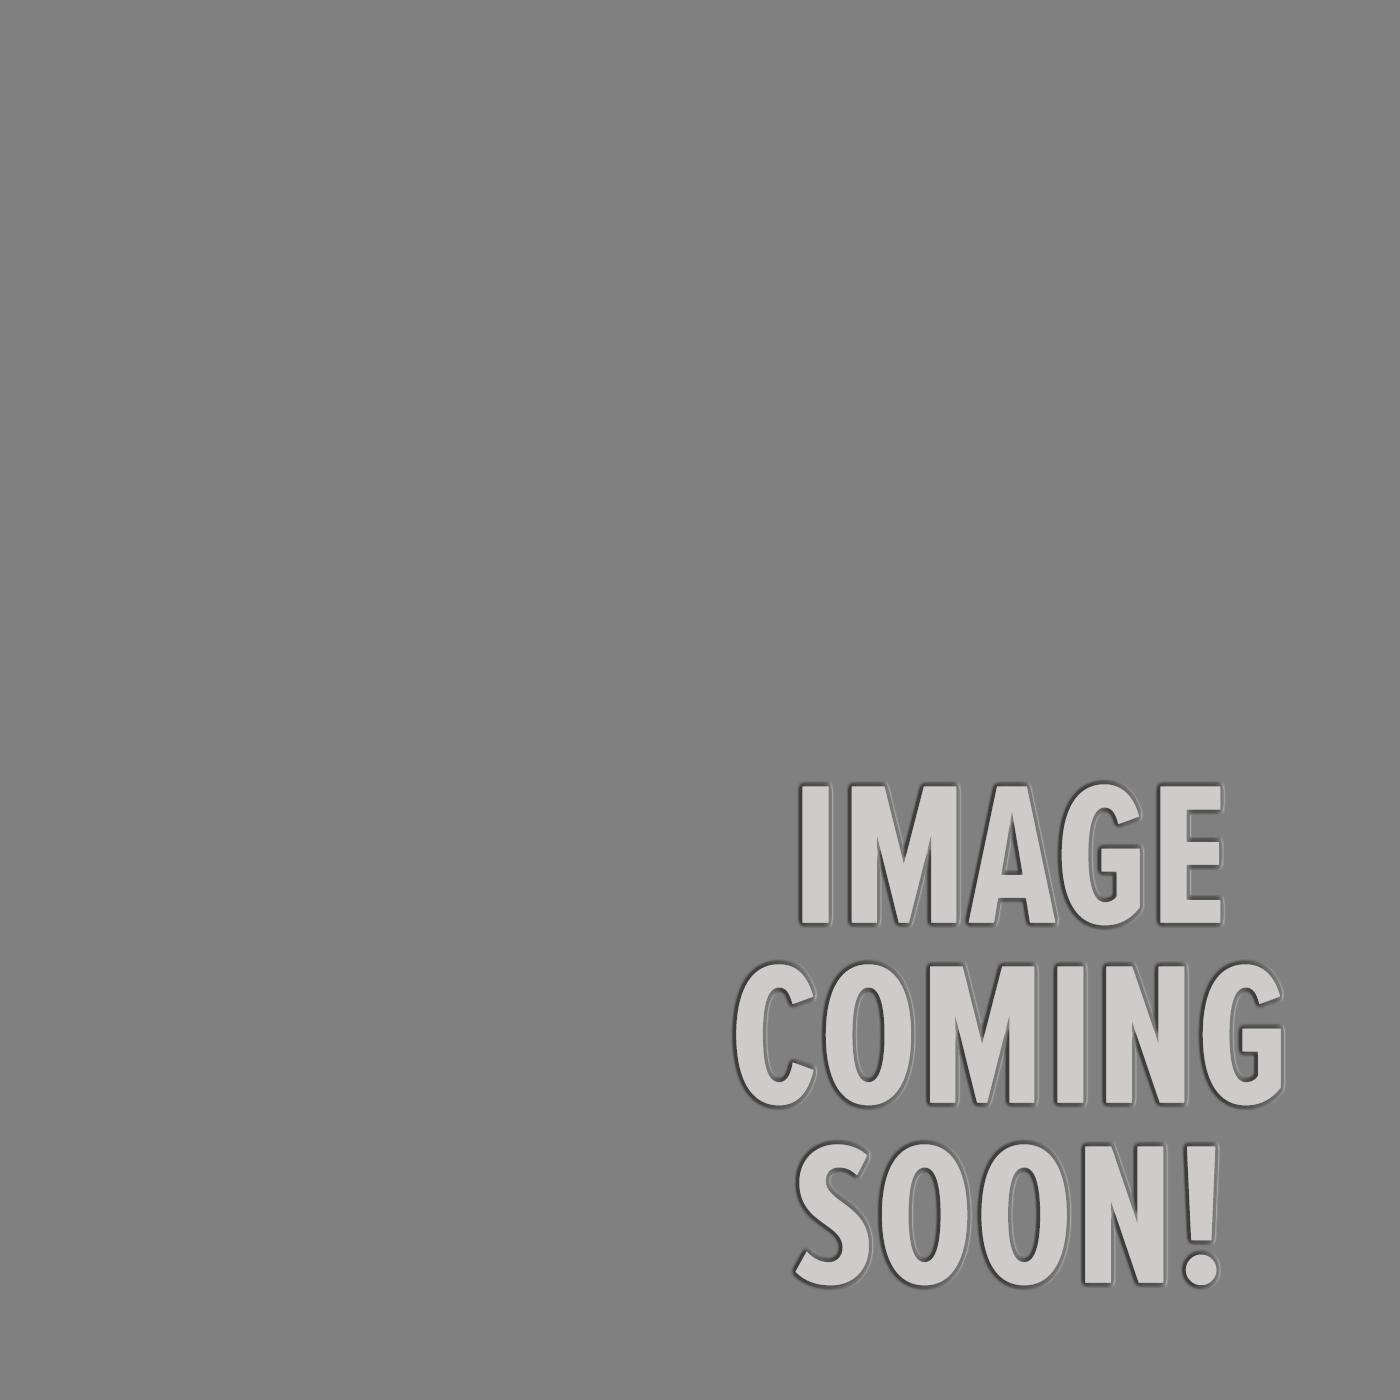 "Evans 16"" G1 Coated Bass Drum Head"